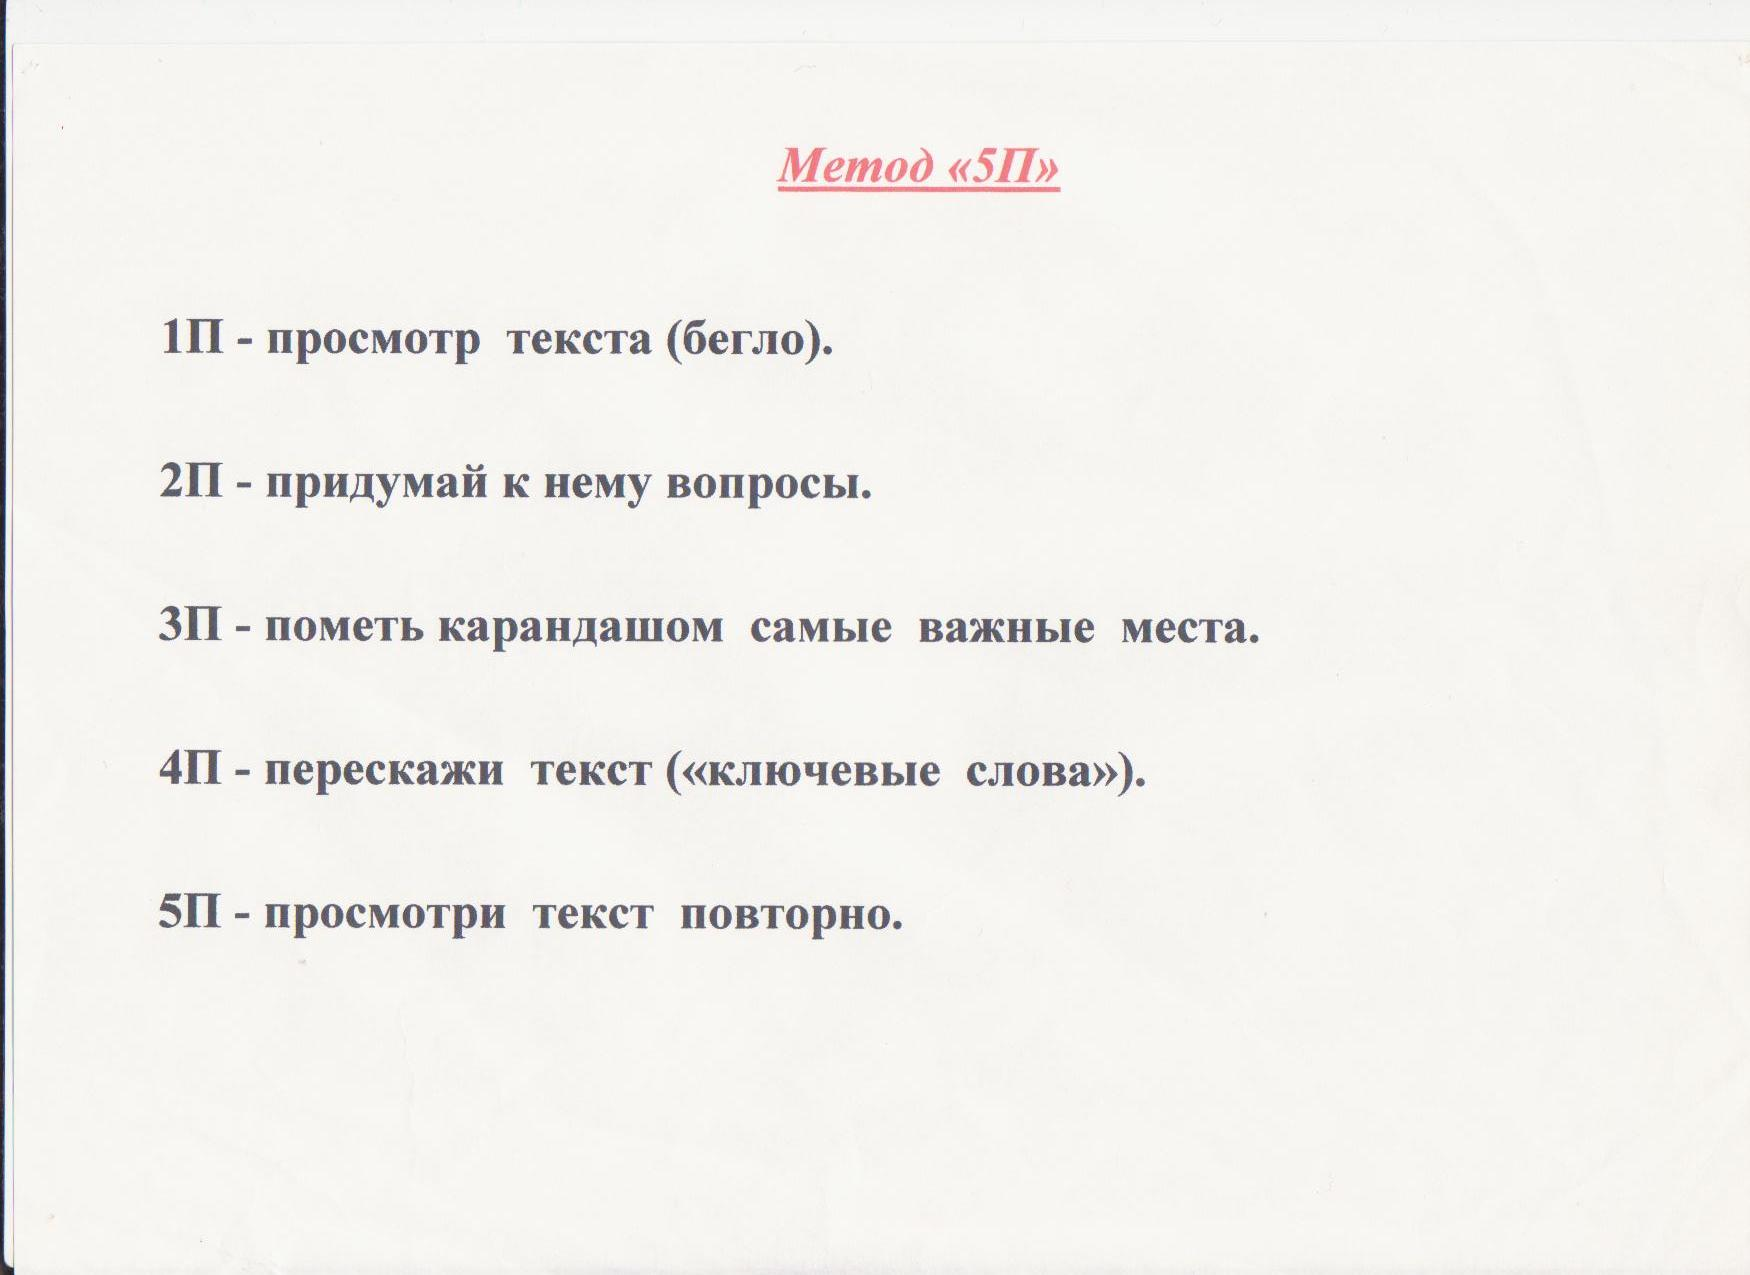 C:\Users\Юля\Desktop\Кузнецова аттестация\сканированные грамоты\Кузнецова 048.jpg